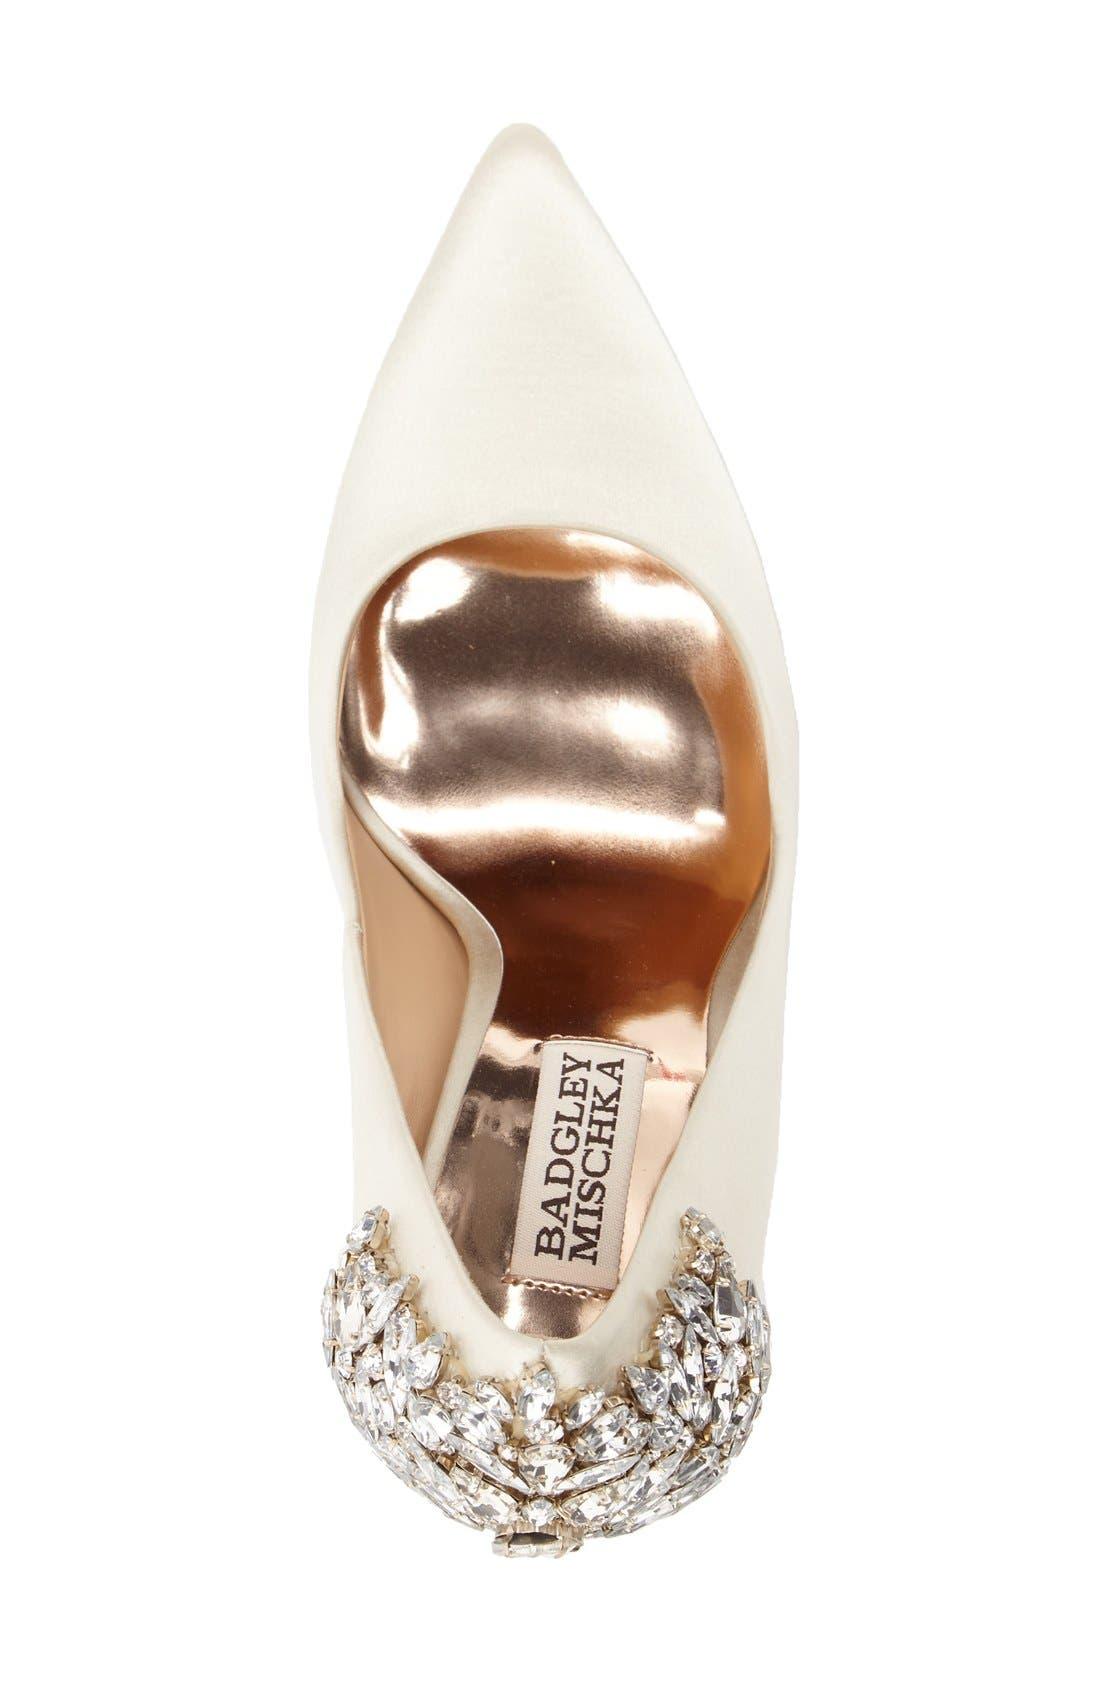 BADGLEY MISCHKA COLLECTION, Badgley Mischka 'Gorgeous' Crystal Embellished Pointy Toe Pump, Alternate thumbnail 3, color, IVORY SATIN